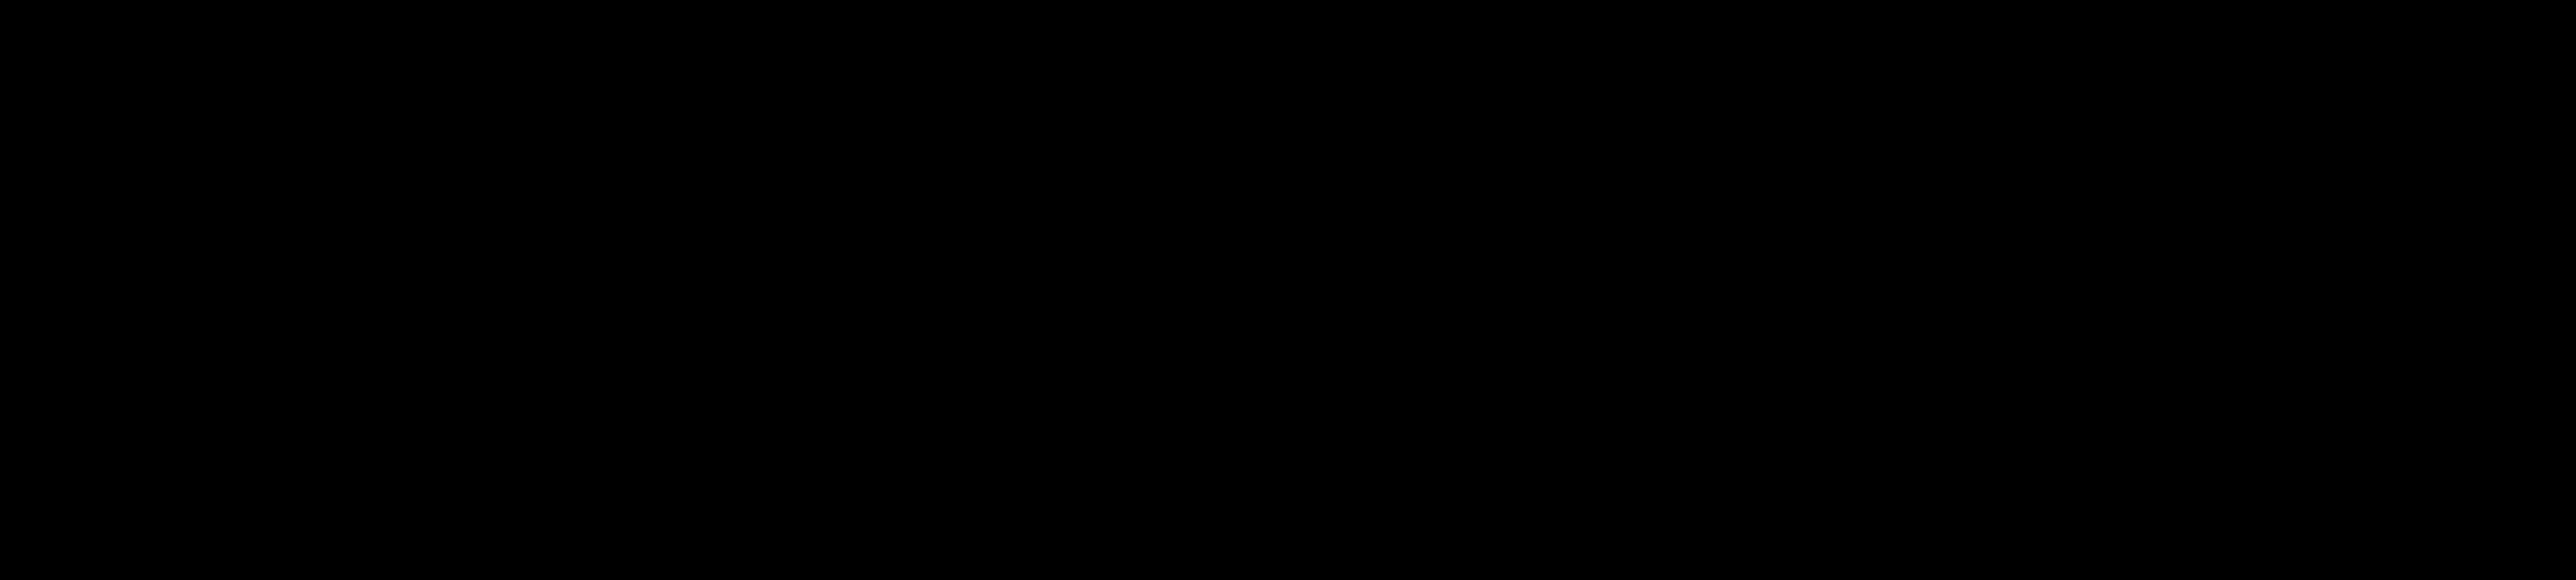 phiandmefontlogo-black2